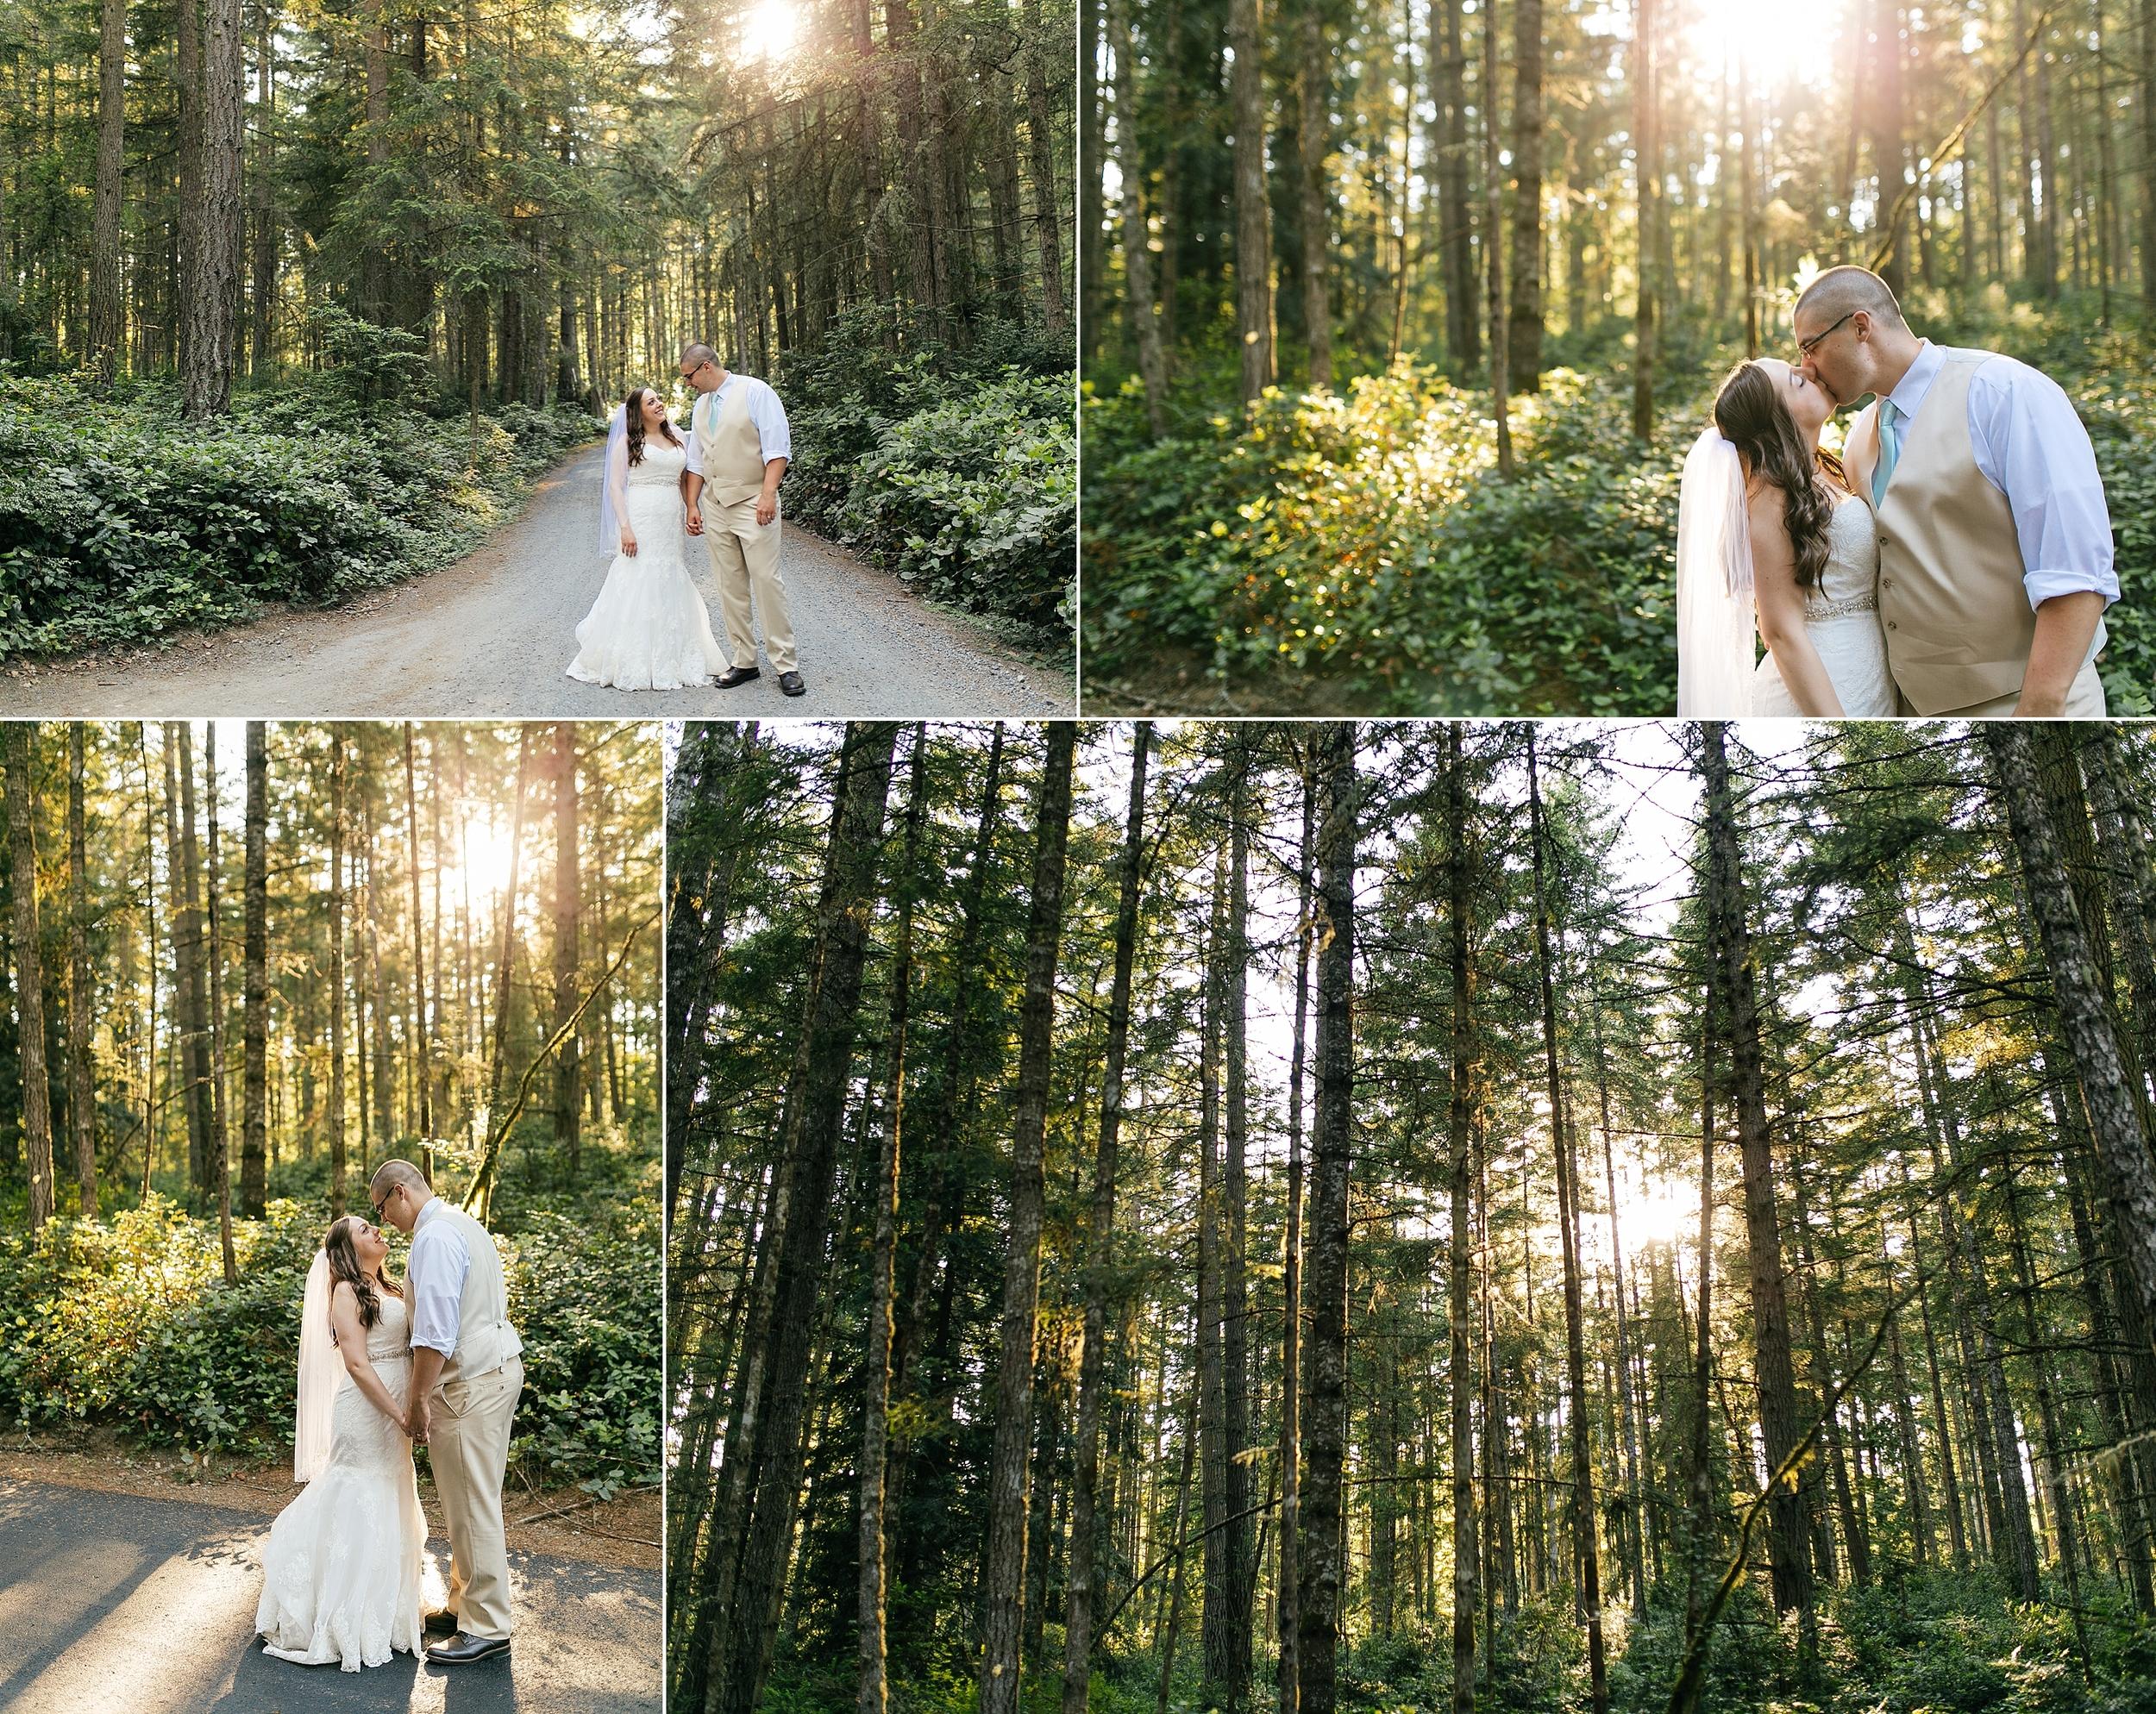 ashley vos photography seattle area wedding photographer_0575.jpg